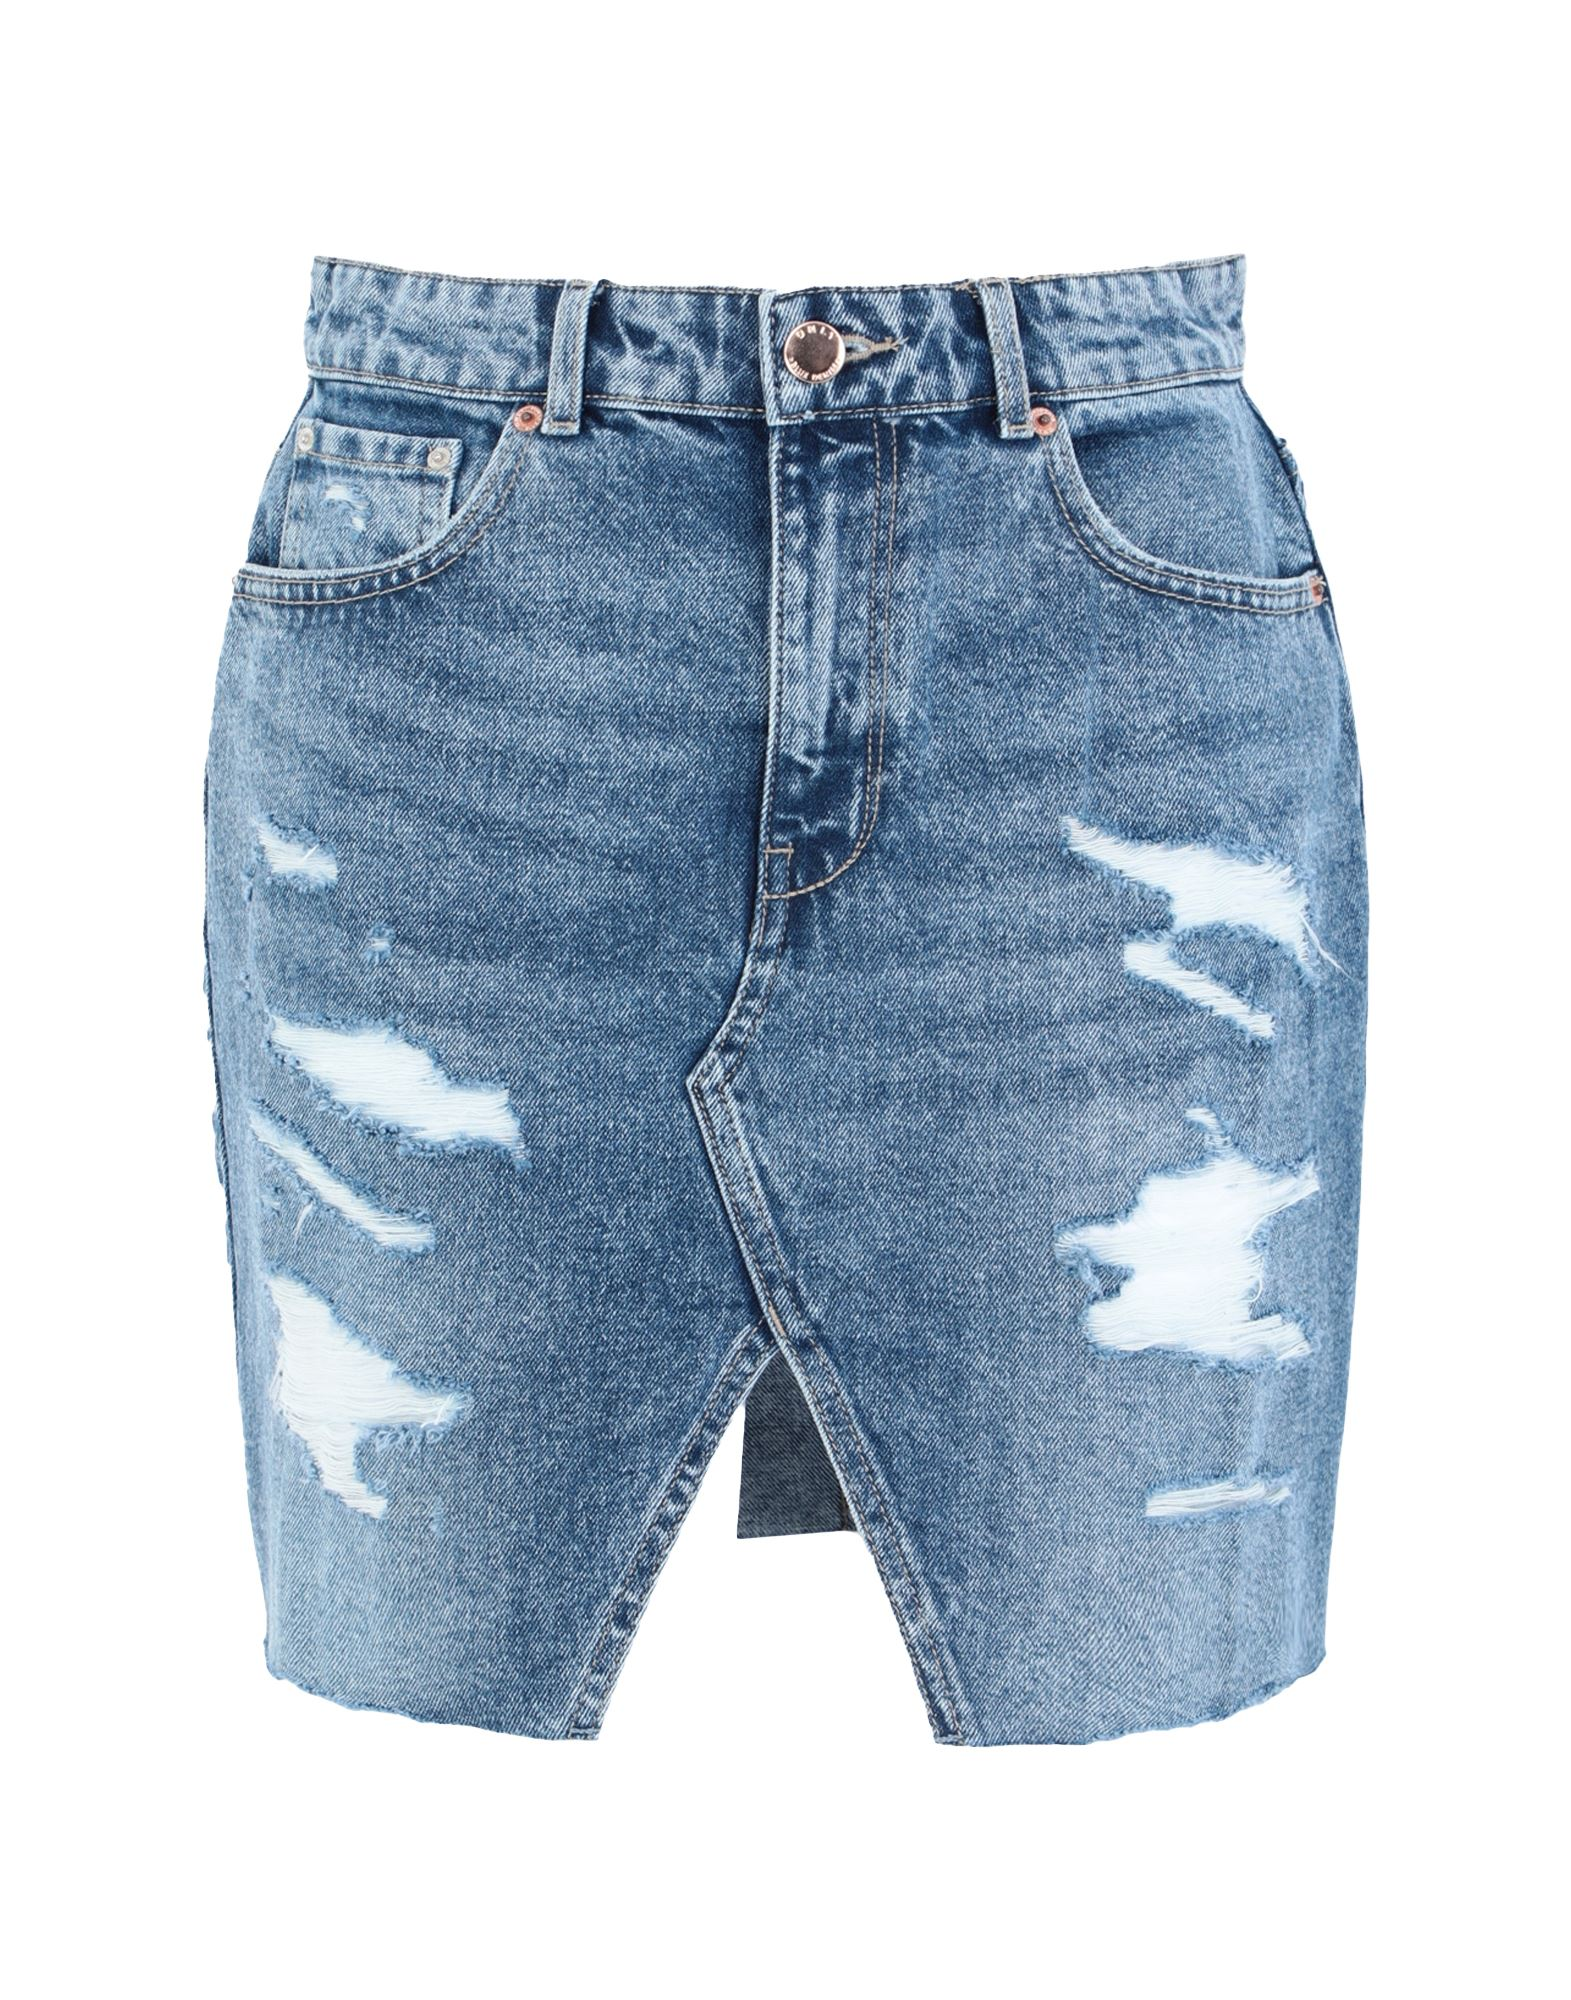 ONLY Denim skirts - Item 42845306